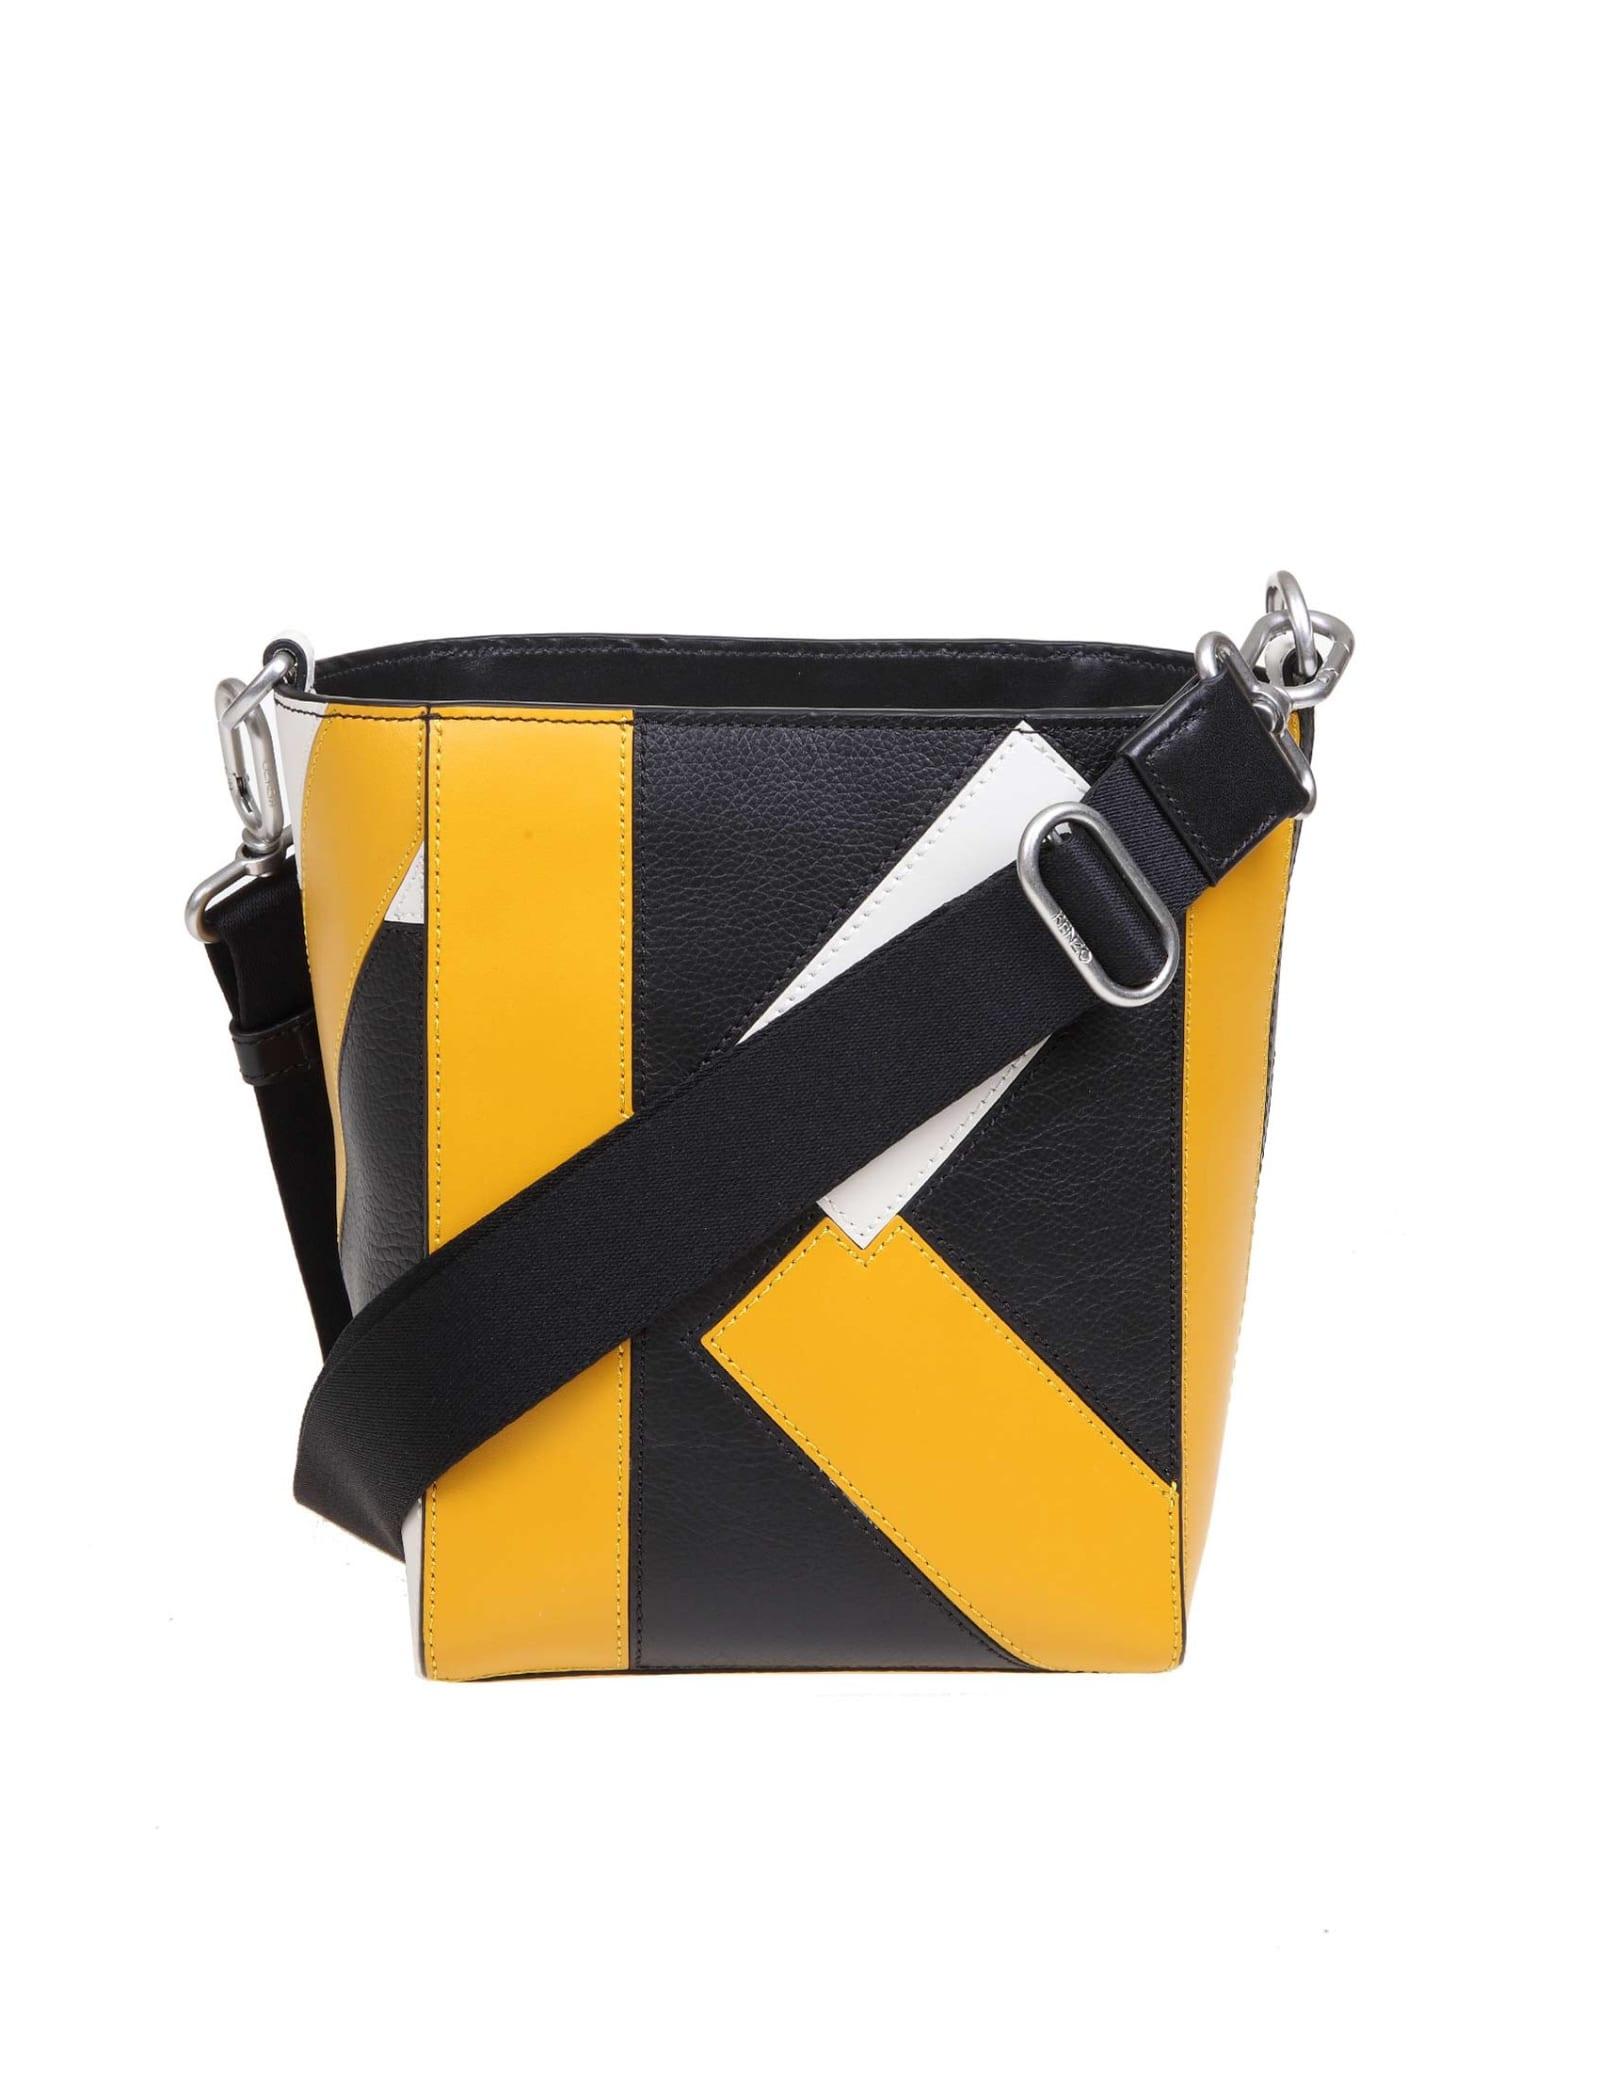 Kenzo Kube Small Leather Shoulder Bag